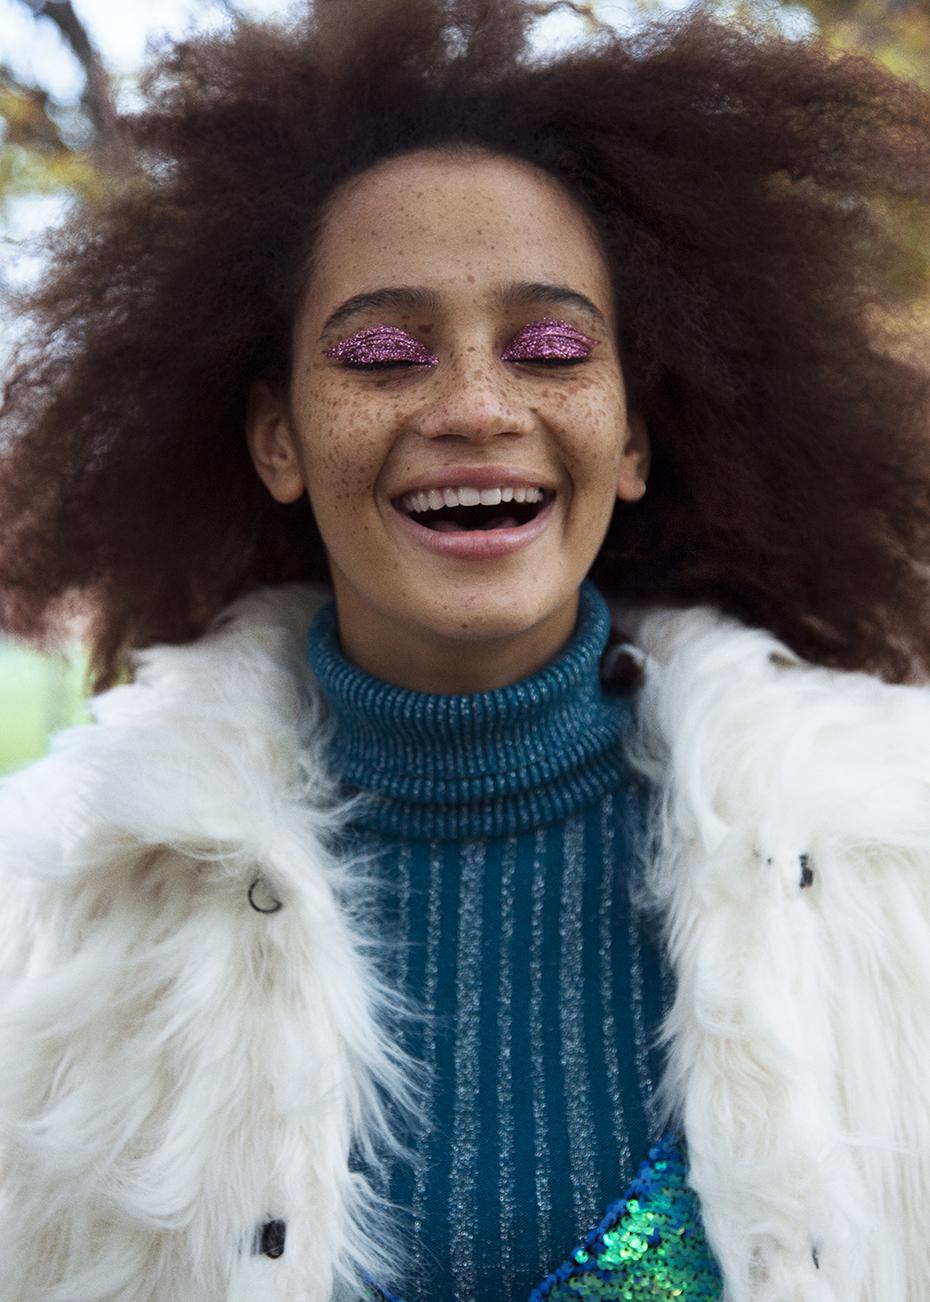 fashion photography portfolio ideas show your identity